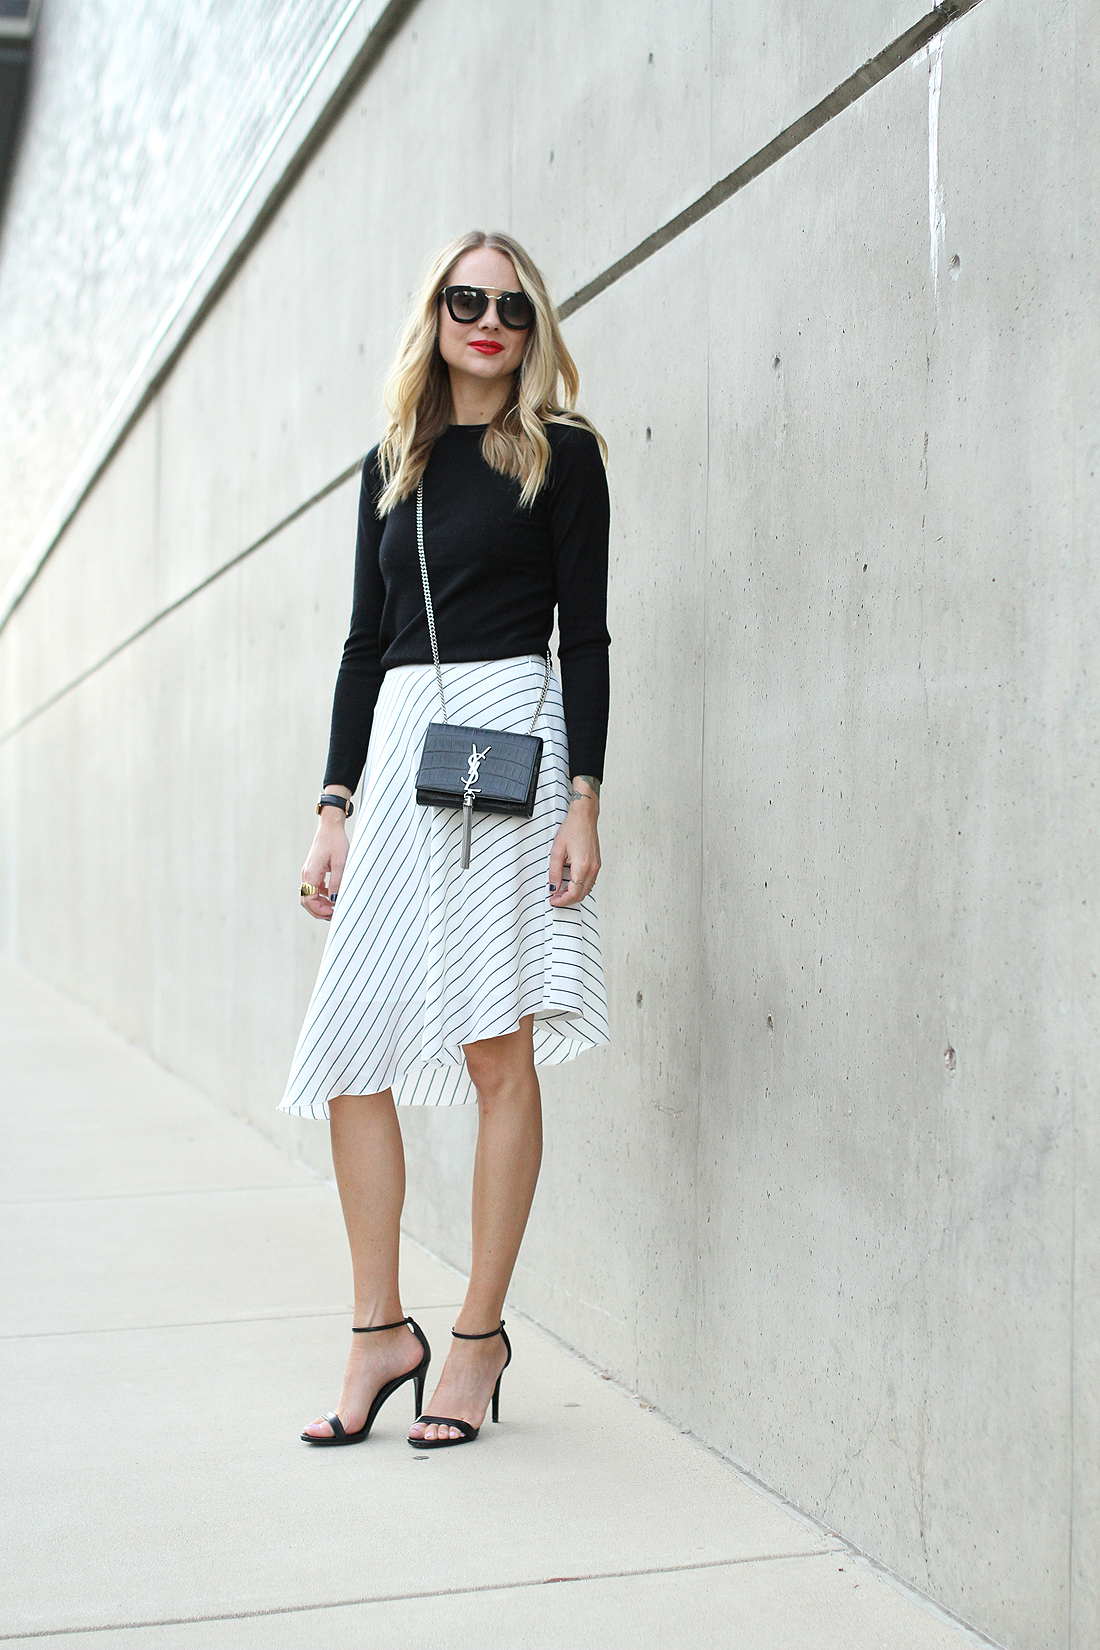 fashion-jackson-club-monaco-white-asymmetrical-skirt-black-sweater-saint-laurent-crossbody-prada-sunglasses